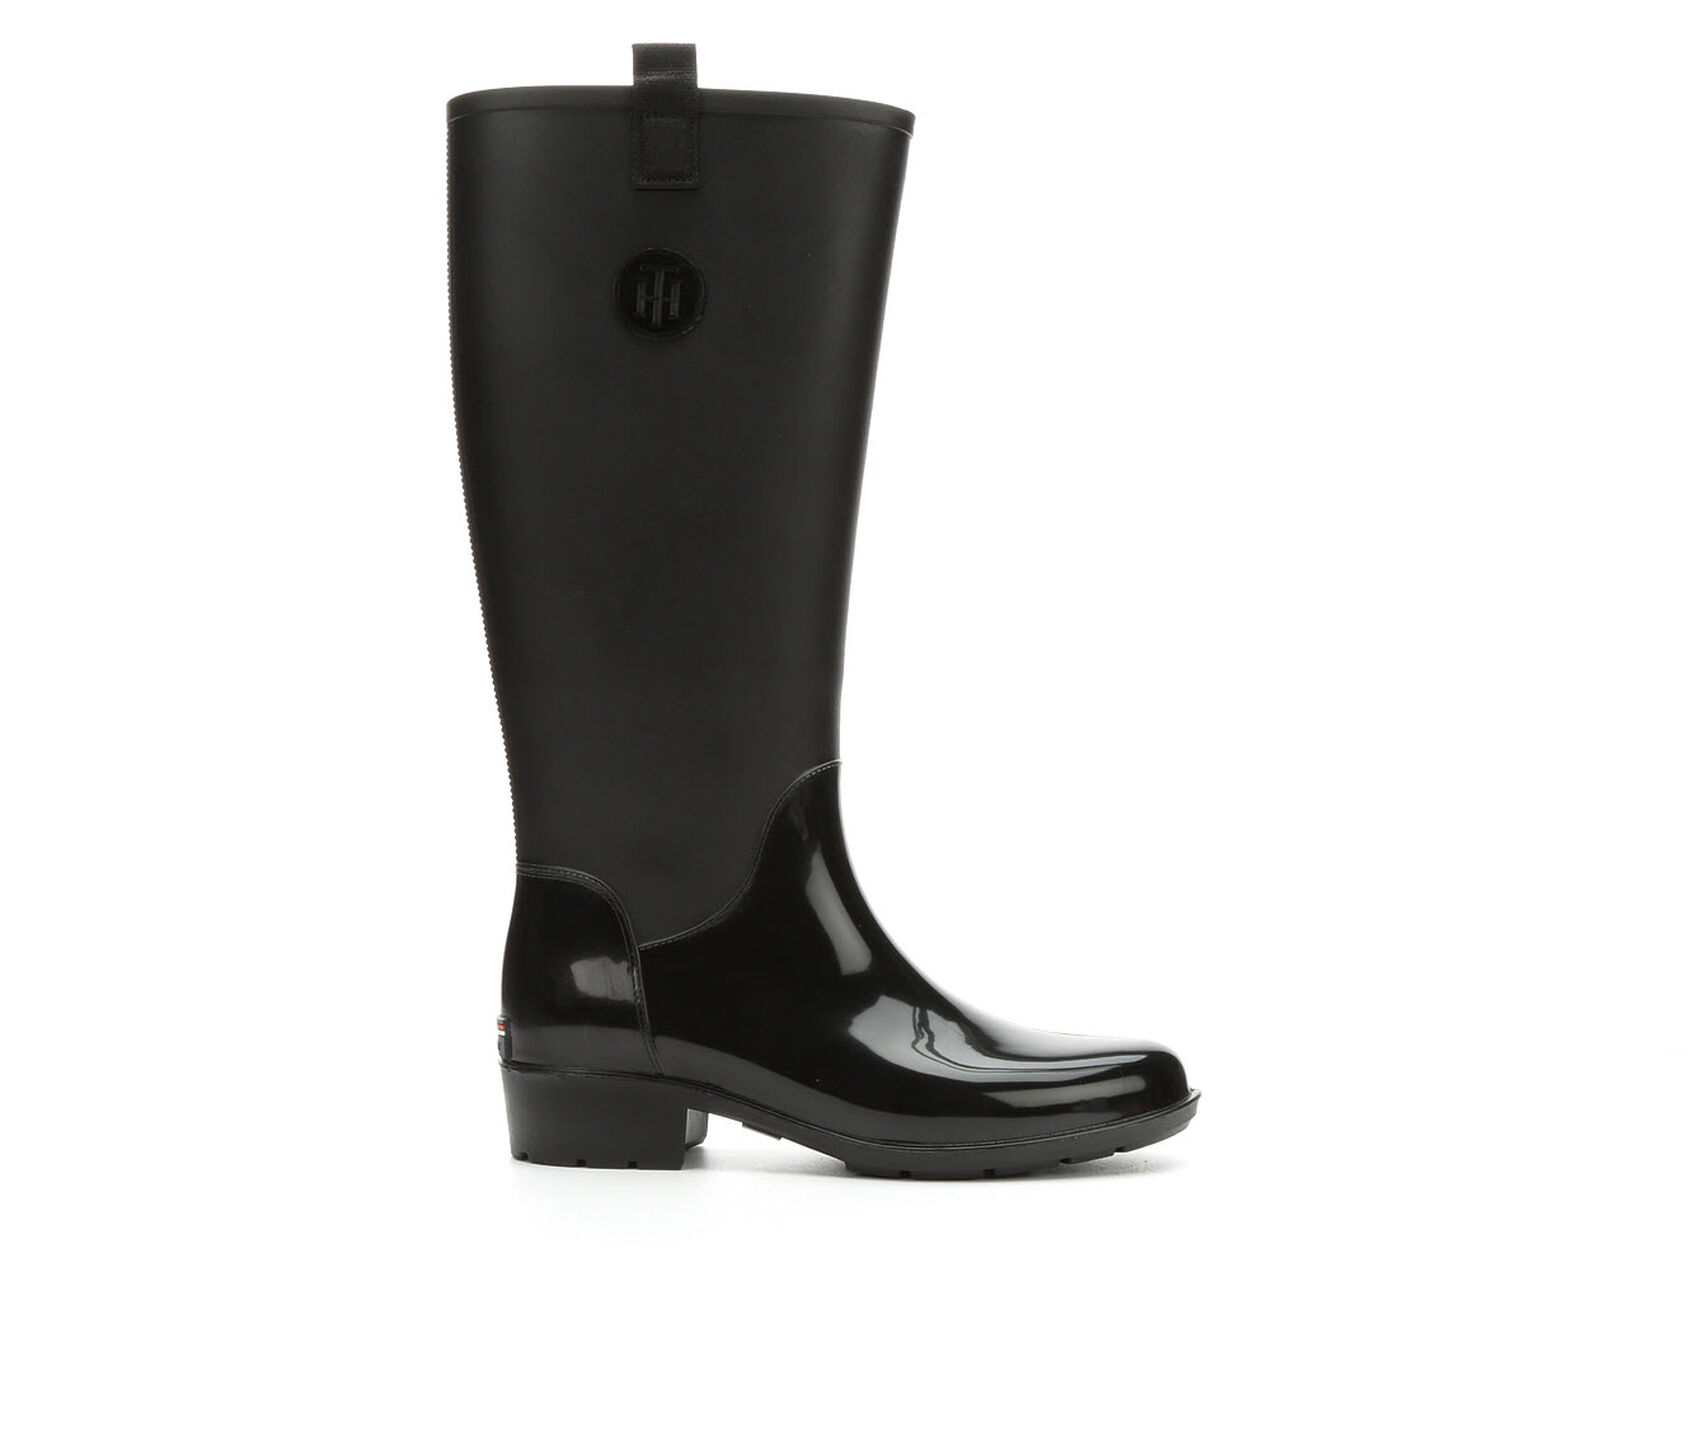 61929bb49 ... Tommy Hilfiger Karissa Rain Boots. Previous